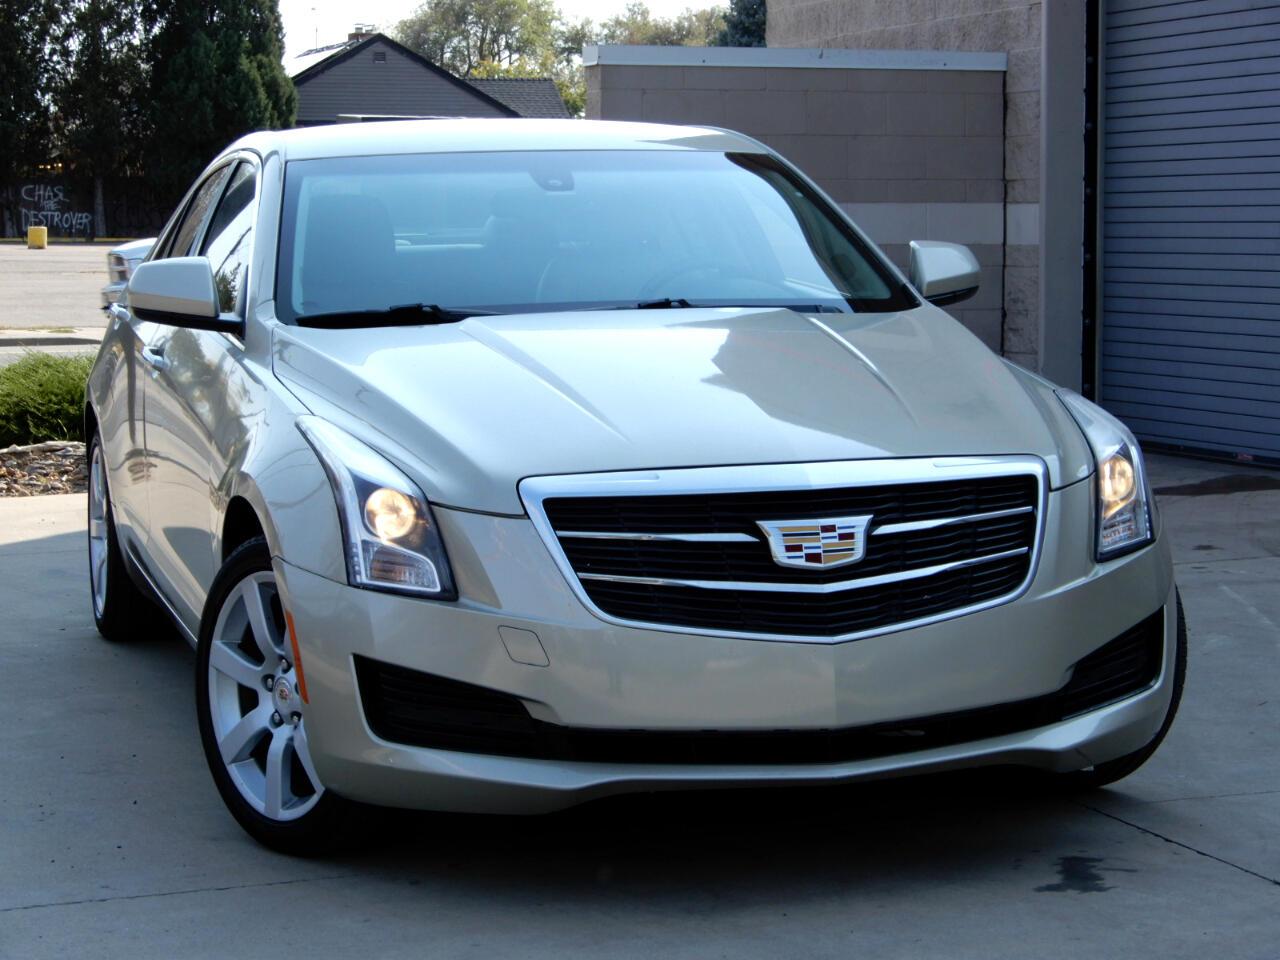 Cadillac ATS Sedan 4dr Sdn 2.5L Standard RWD 2015